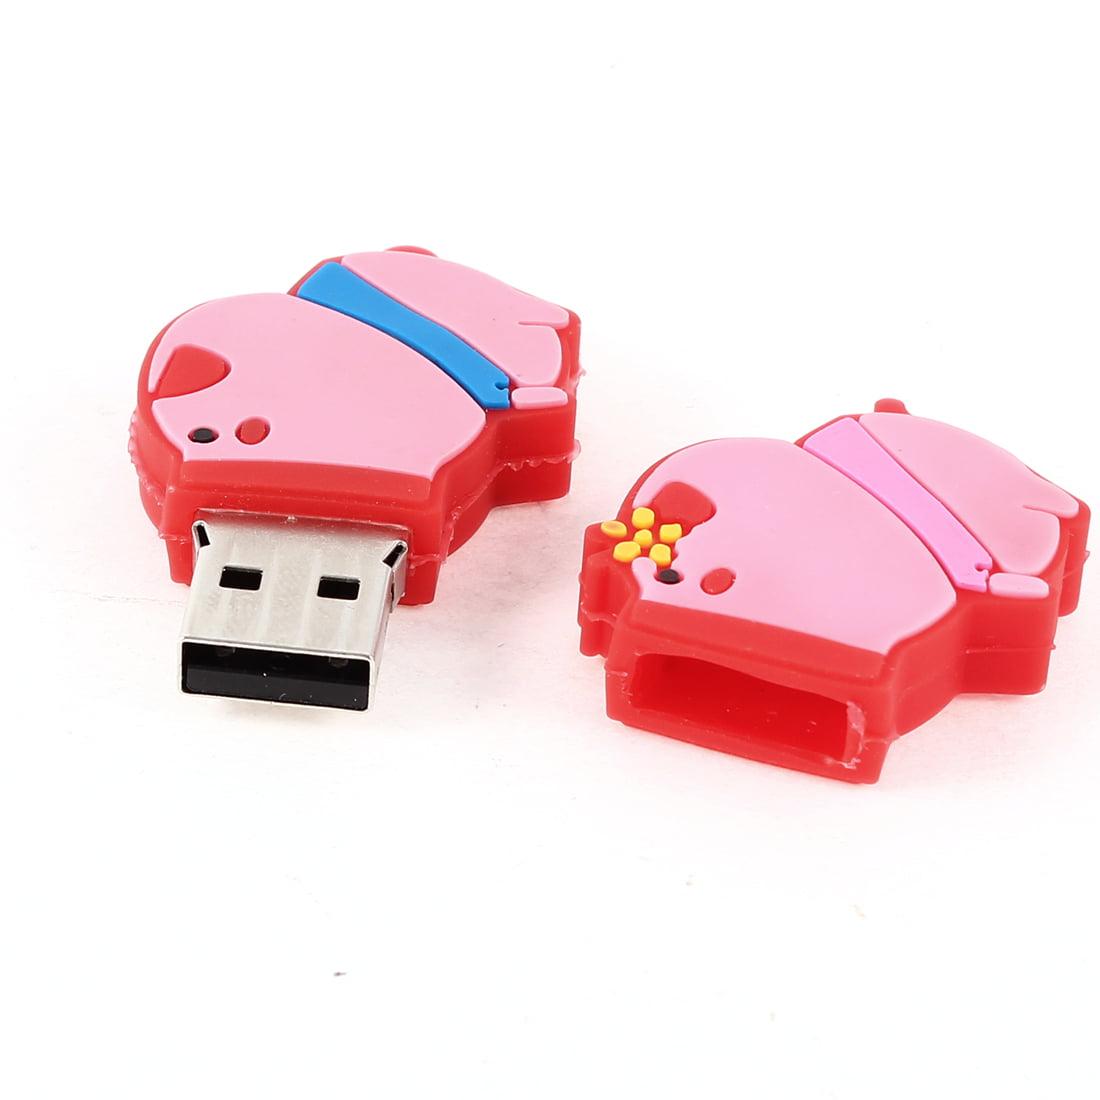 Pink Red Rubber Pig USB 2.0 Flash Memory Drive Storage Media U-Disk 4GB